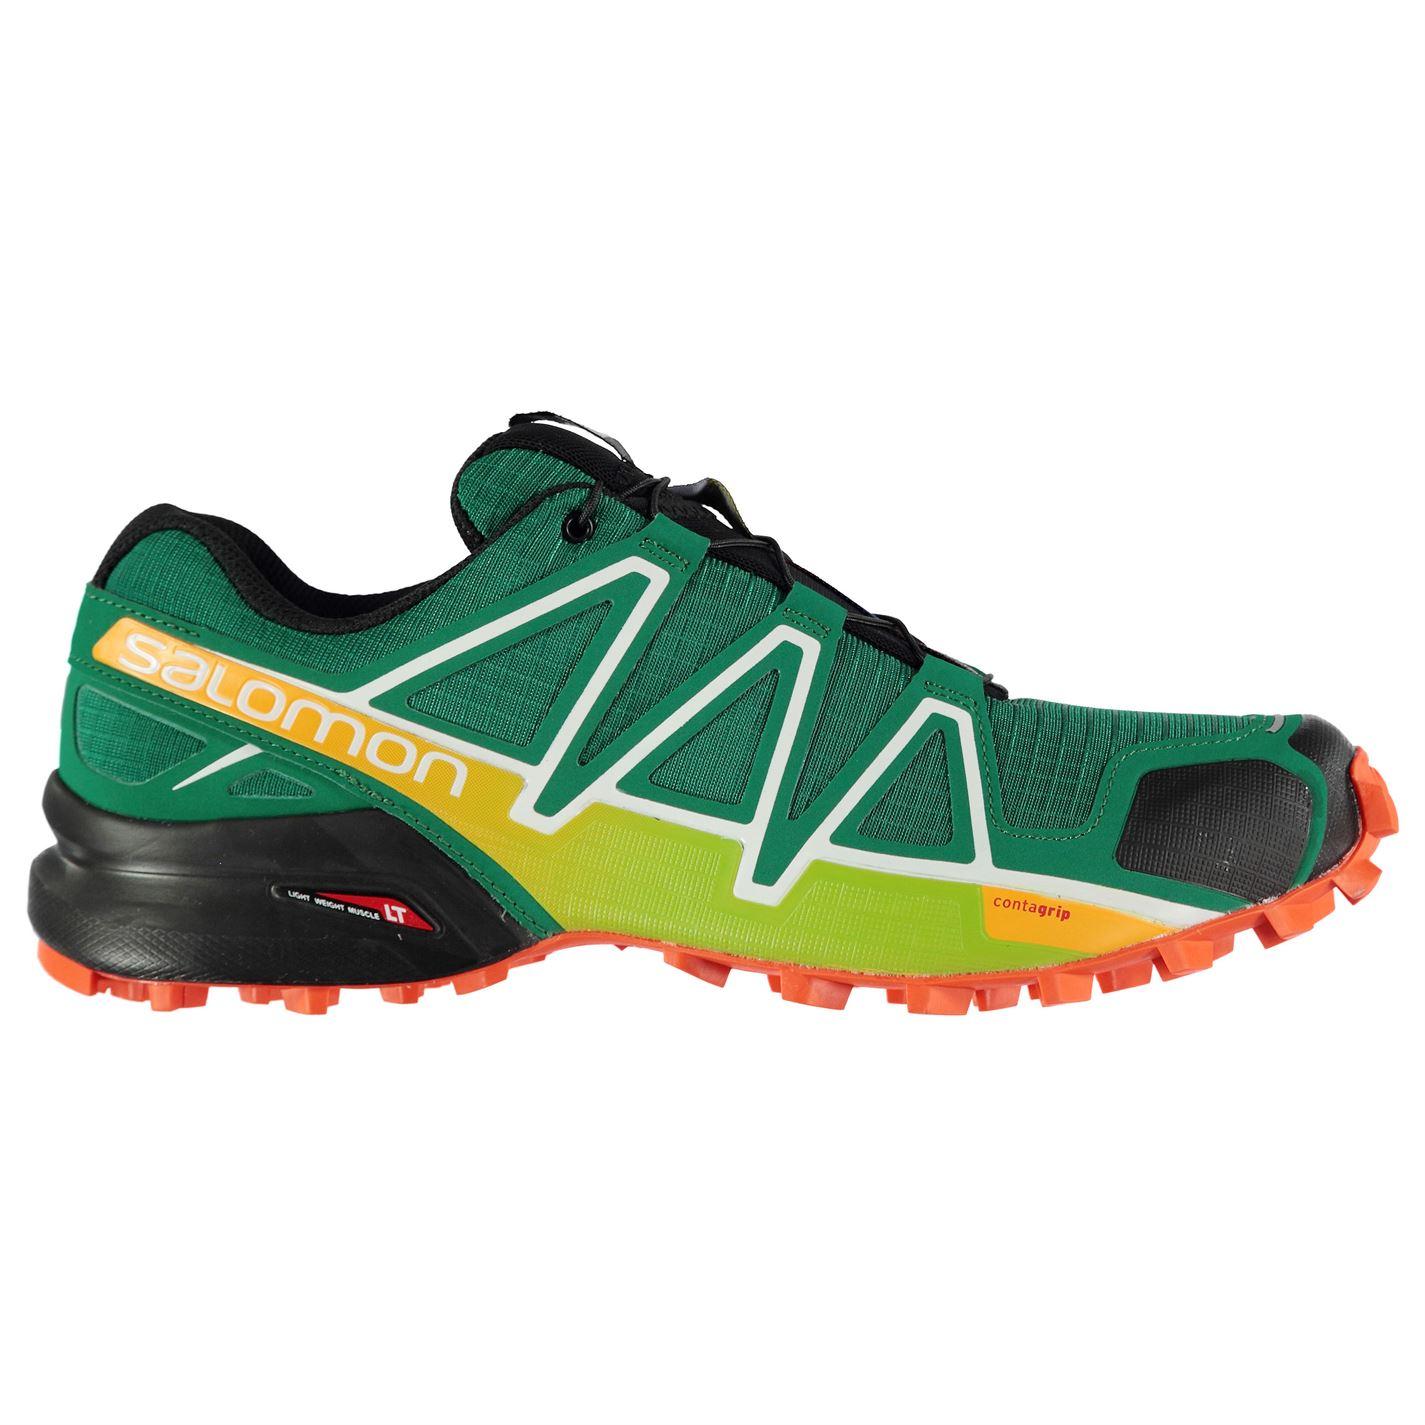 89390ad0a5e ... Salomon Speedcross 4 Běžecké boty Pánské. -10% -12%